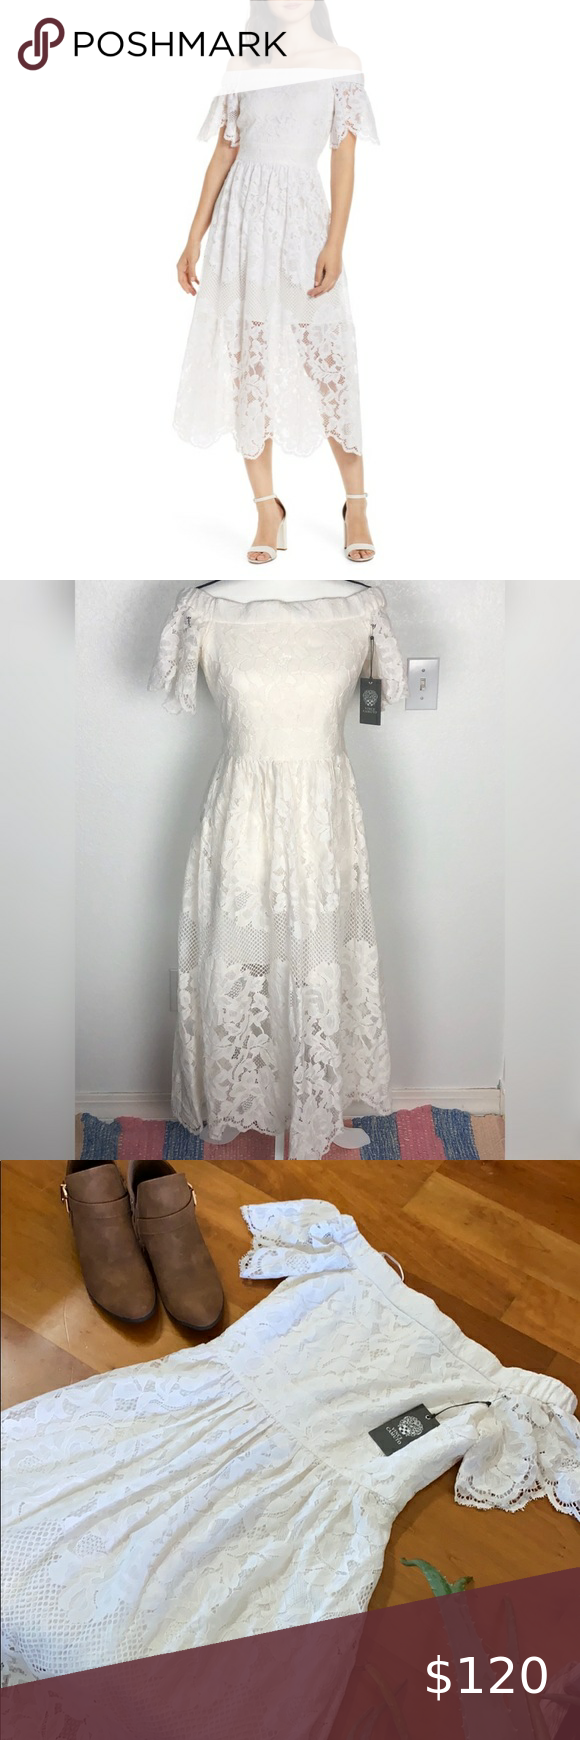 Nwt Vince Camuto White Lace Boho Dress Sz 4 Lace Dress Boho White Lace Dress Boho White Floral Lace Dress [ 1740 x 580 Pixel ]